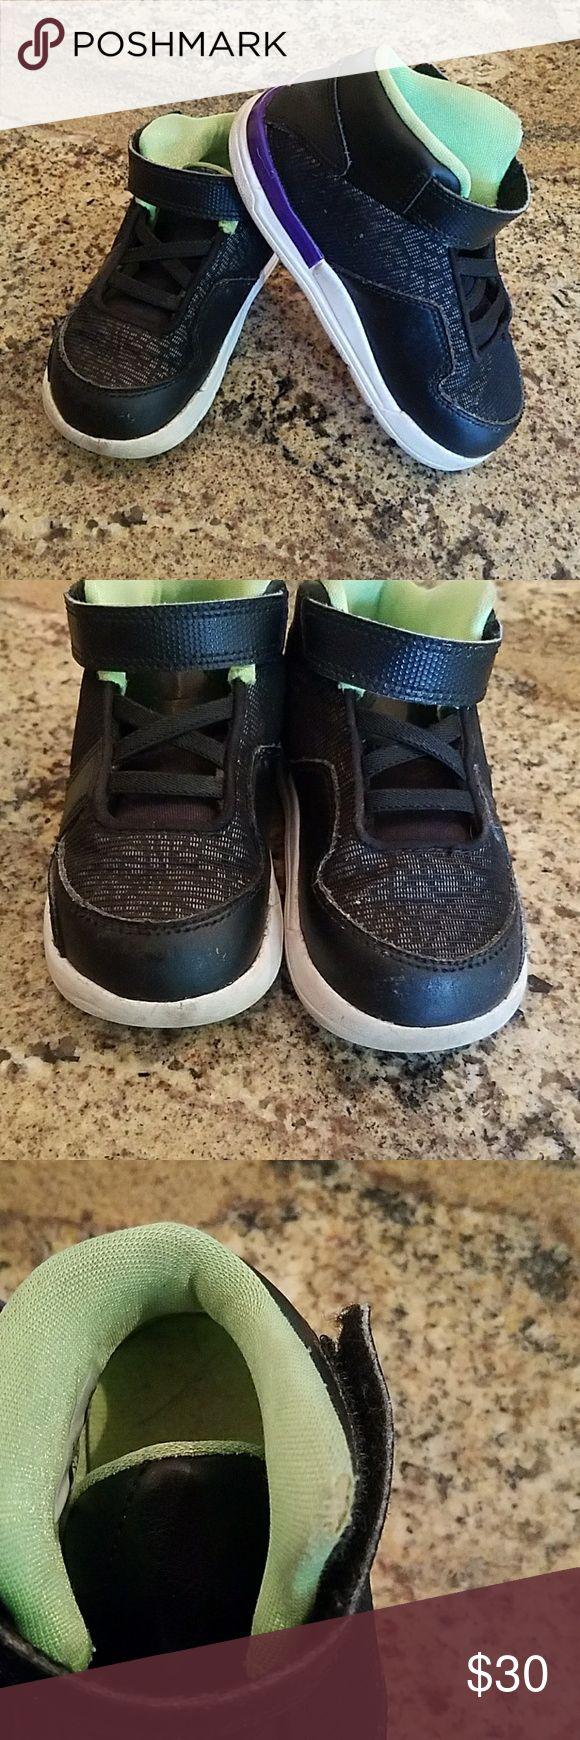 Jordan flight club  toddler sneaker Jordan flight club toddler sneaker size 8c Jordan Shoes Sneakers